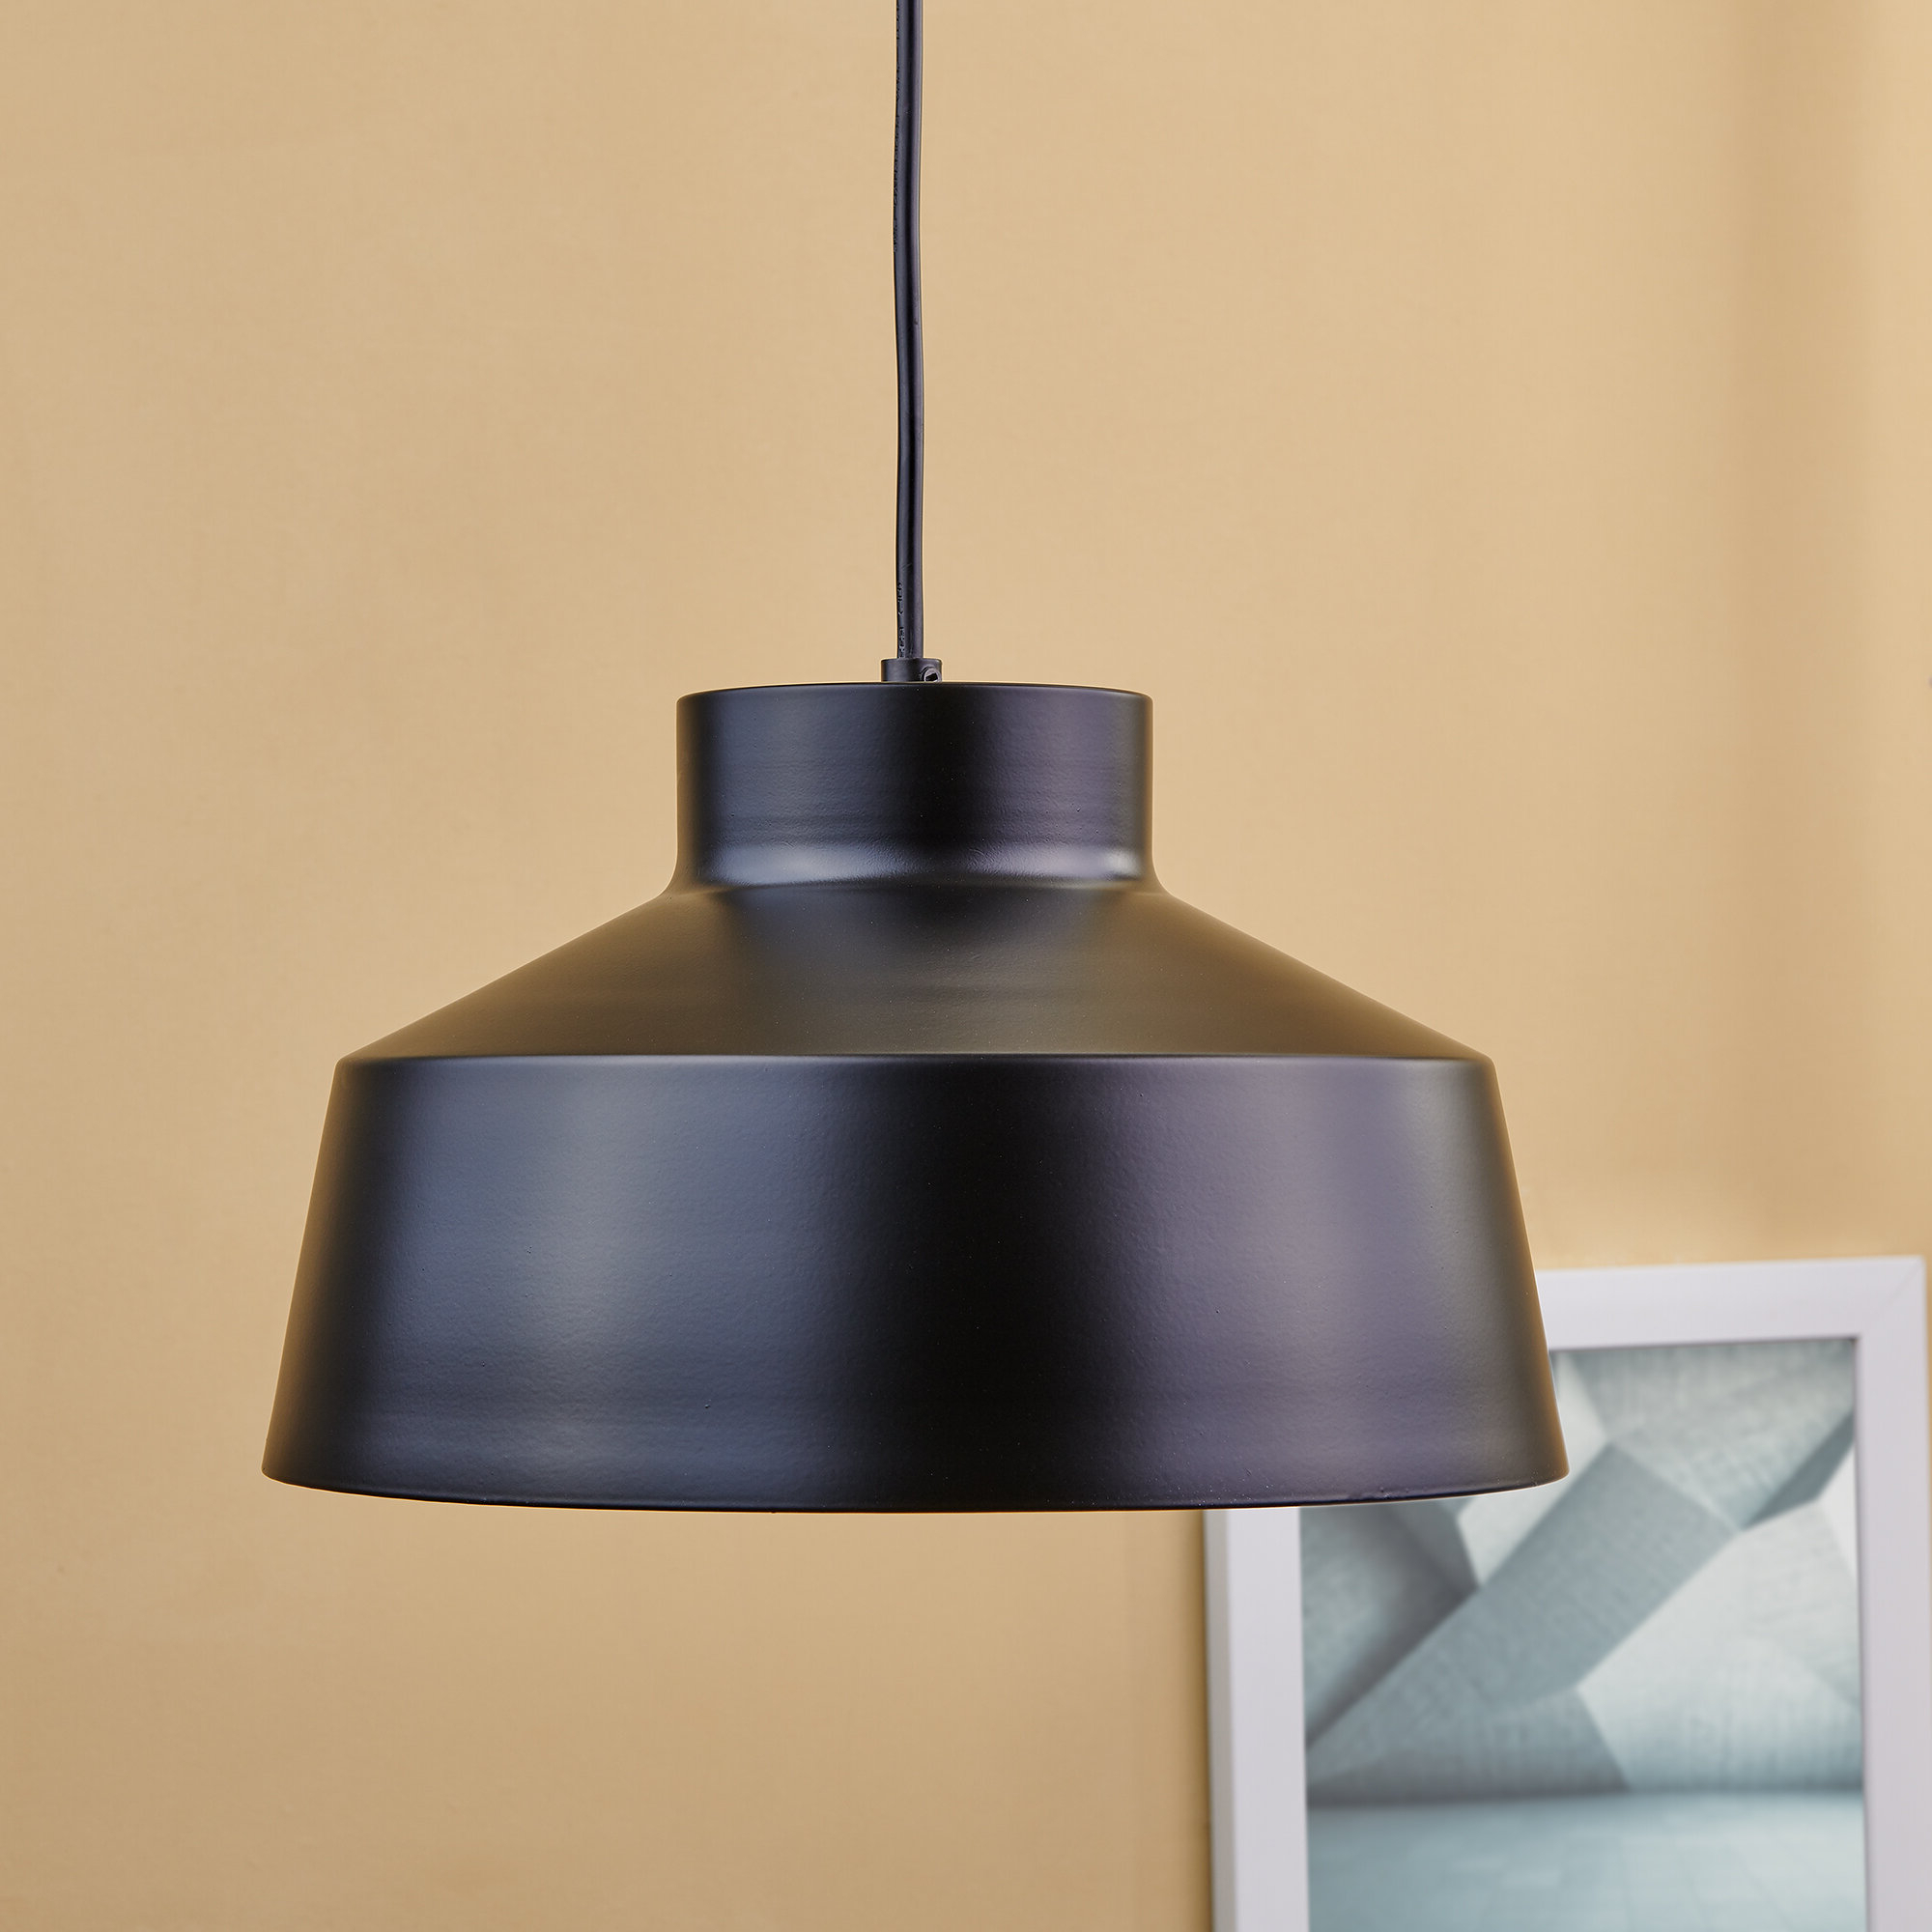 Newest 1 Light Single Dome Pendants With Regard To Cadwell 1 Light Single Dome Pendant (Gallery 8 of 20)